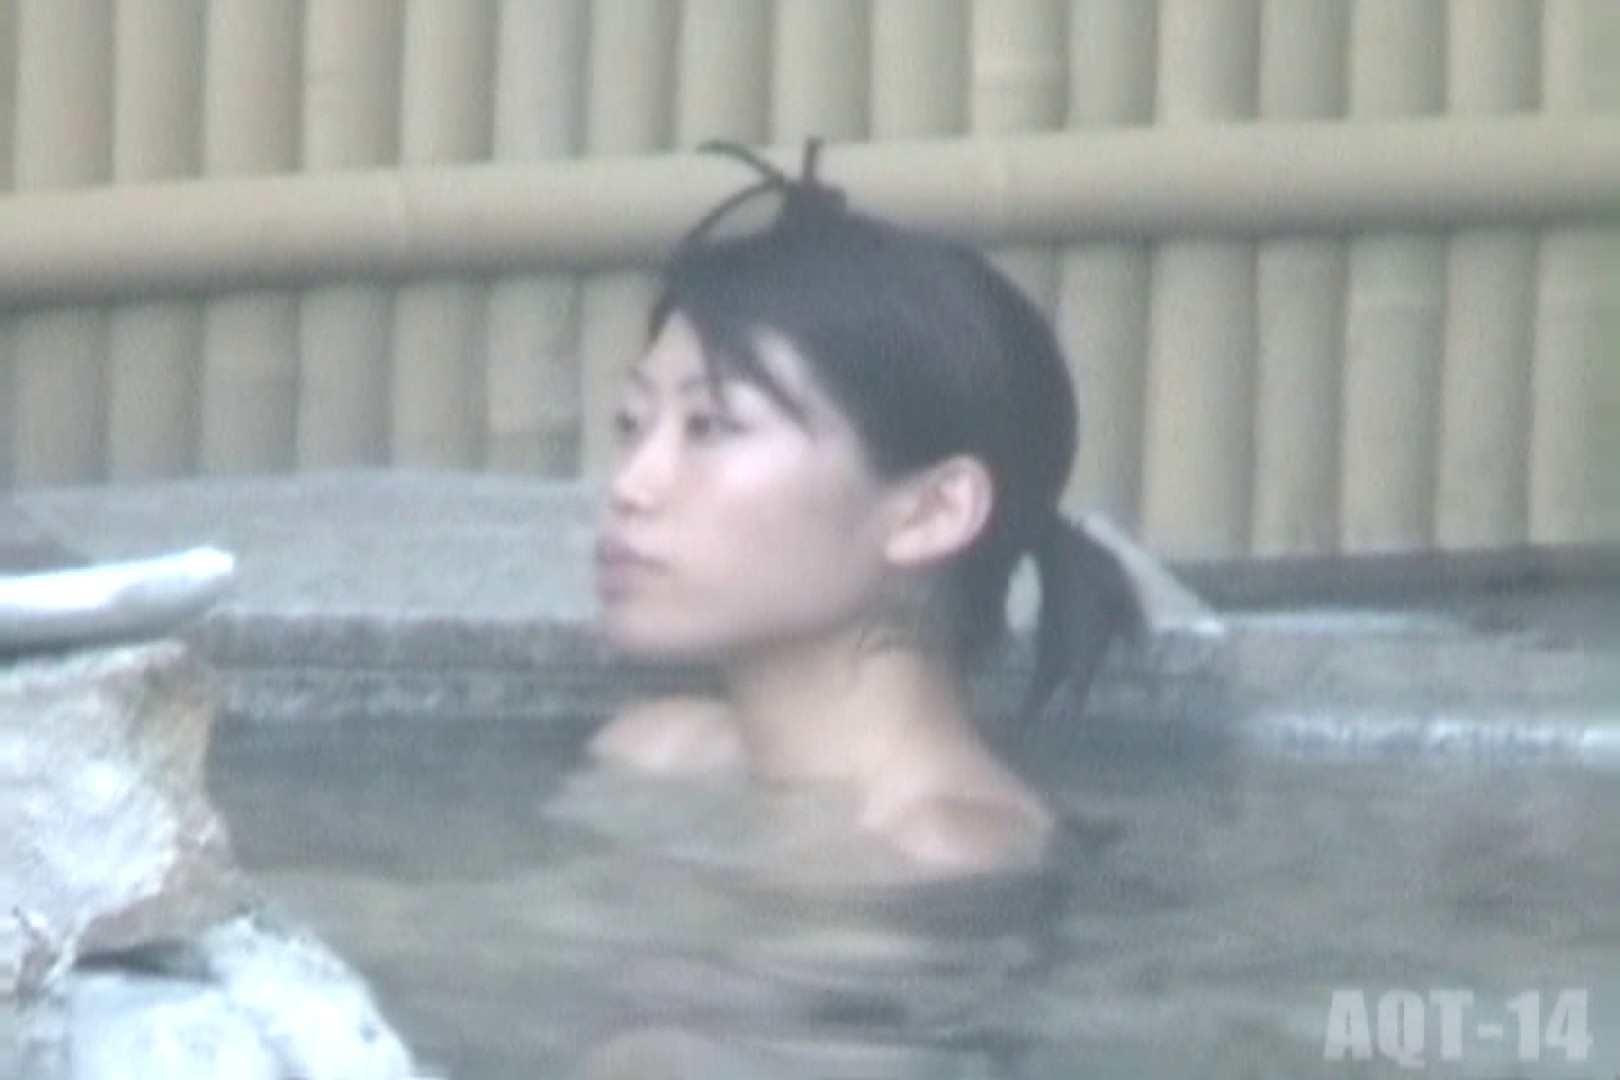 Aquaな露天風呂Vol.820 HなOL   盗撮  92pic 83